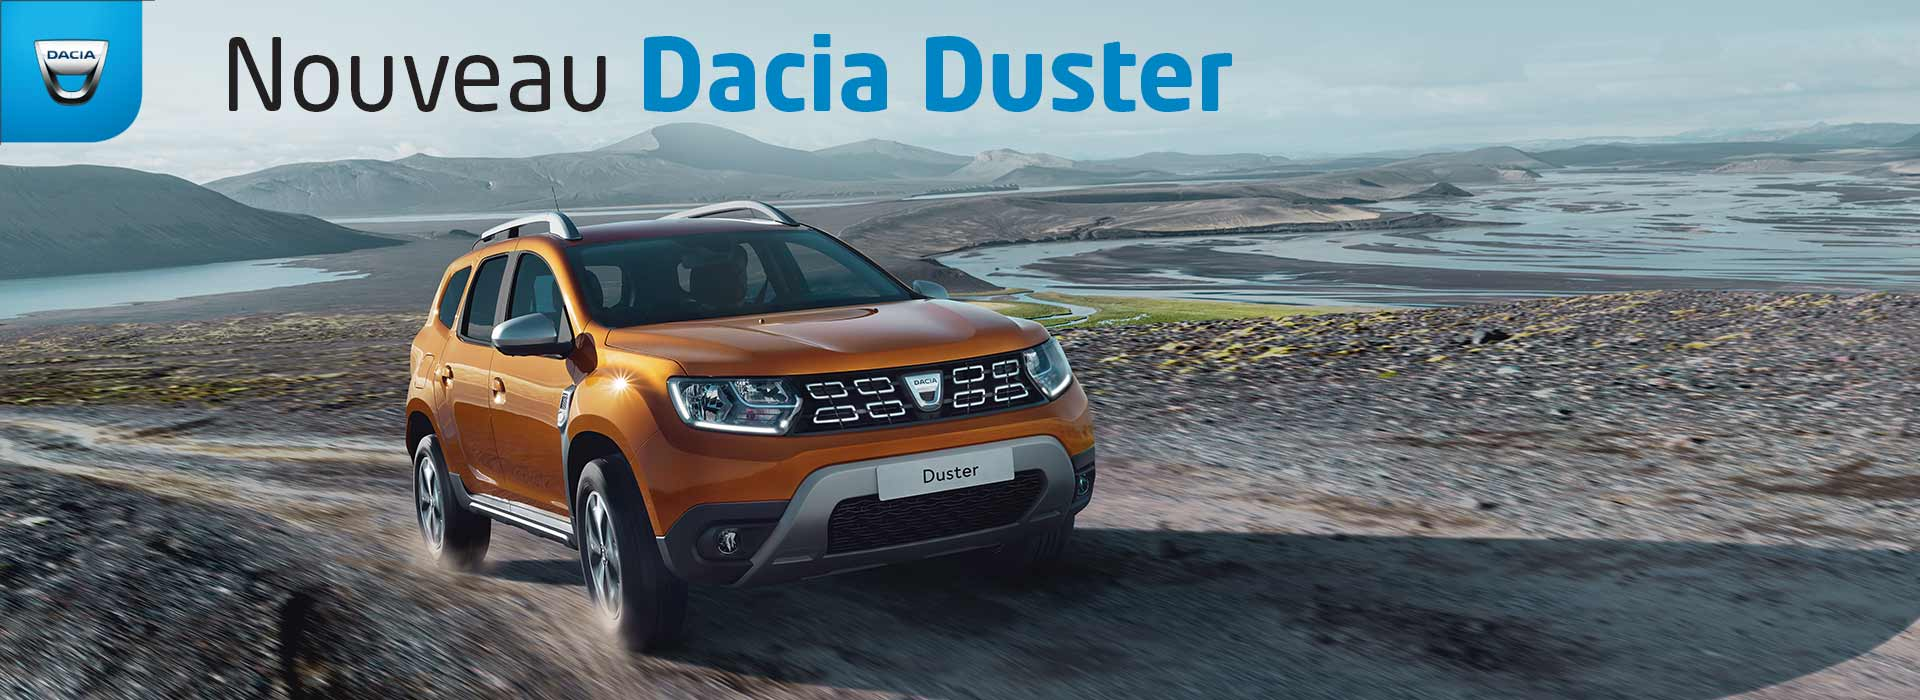 Dacia marignane concessionnaire garage bouches du rh ne 13 - Garage citroen marignane ...